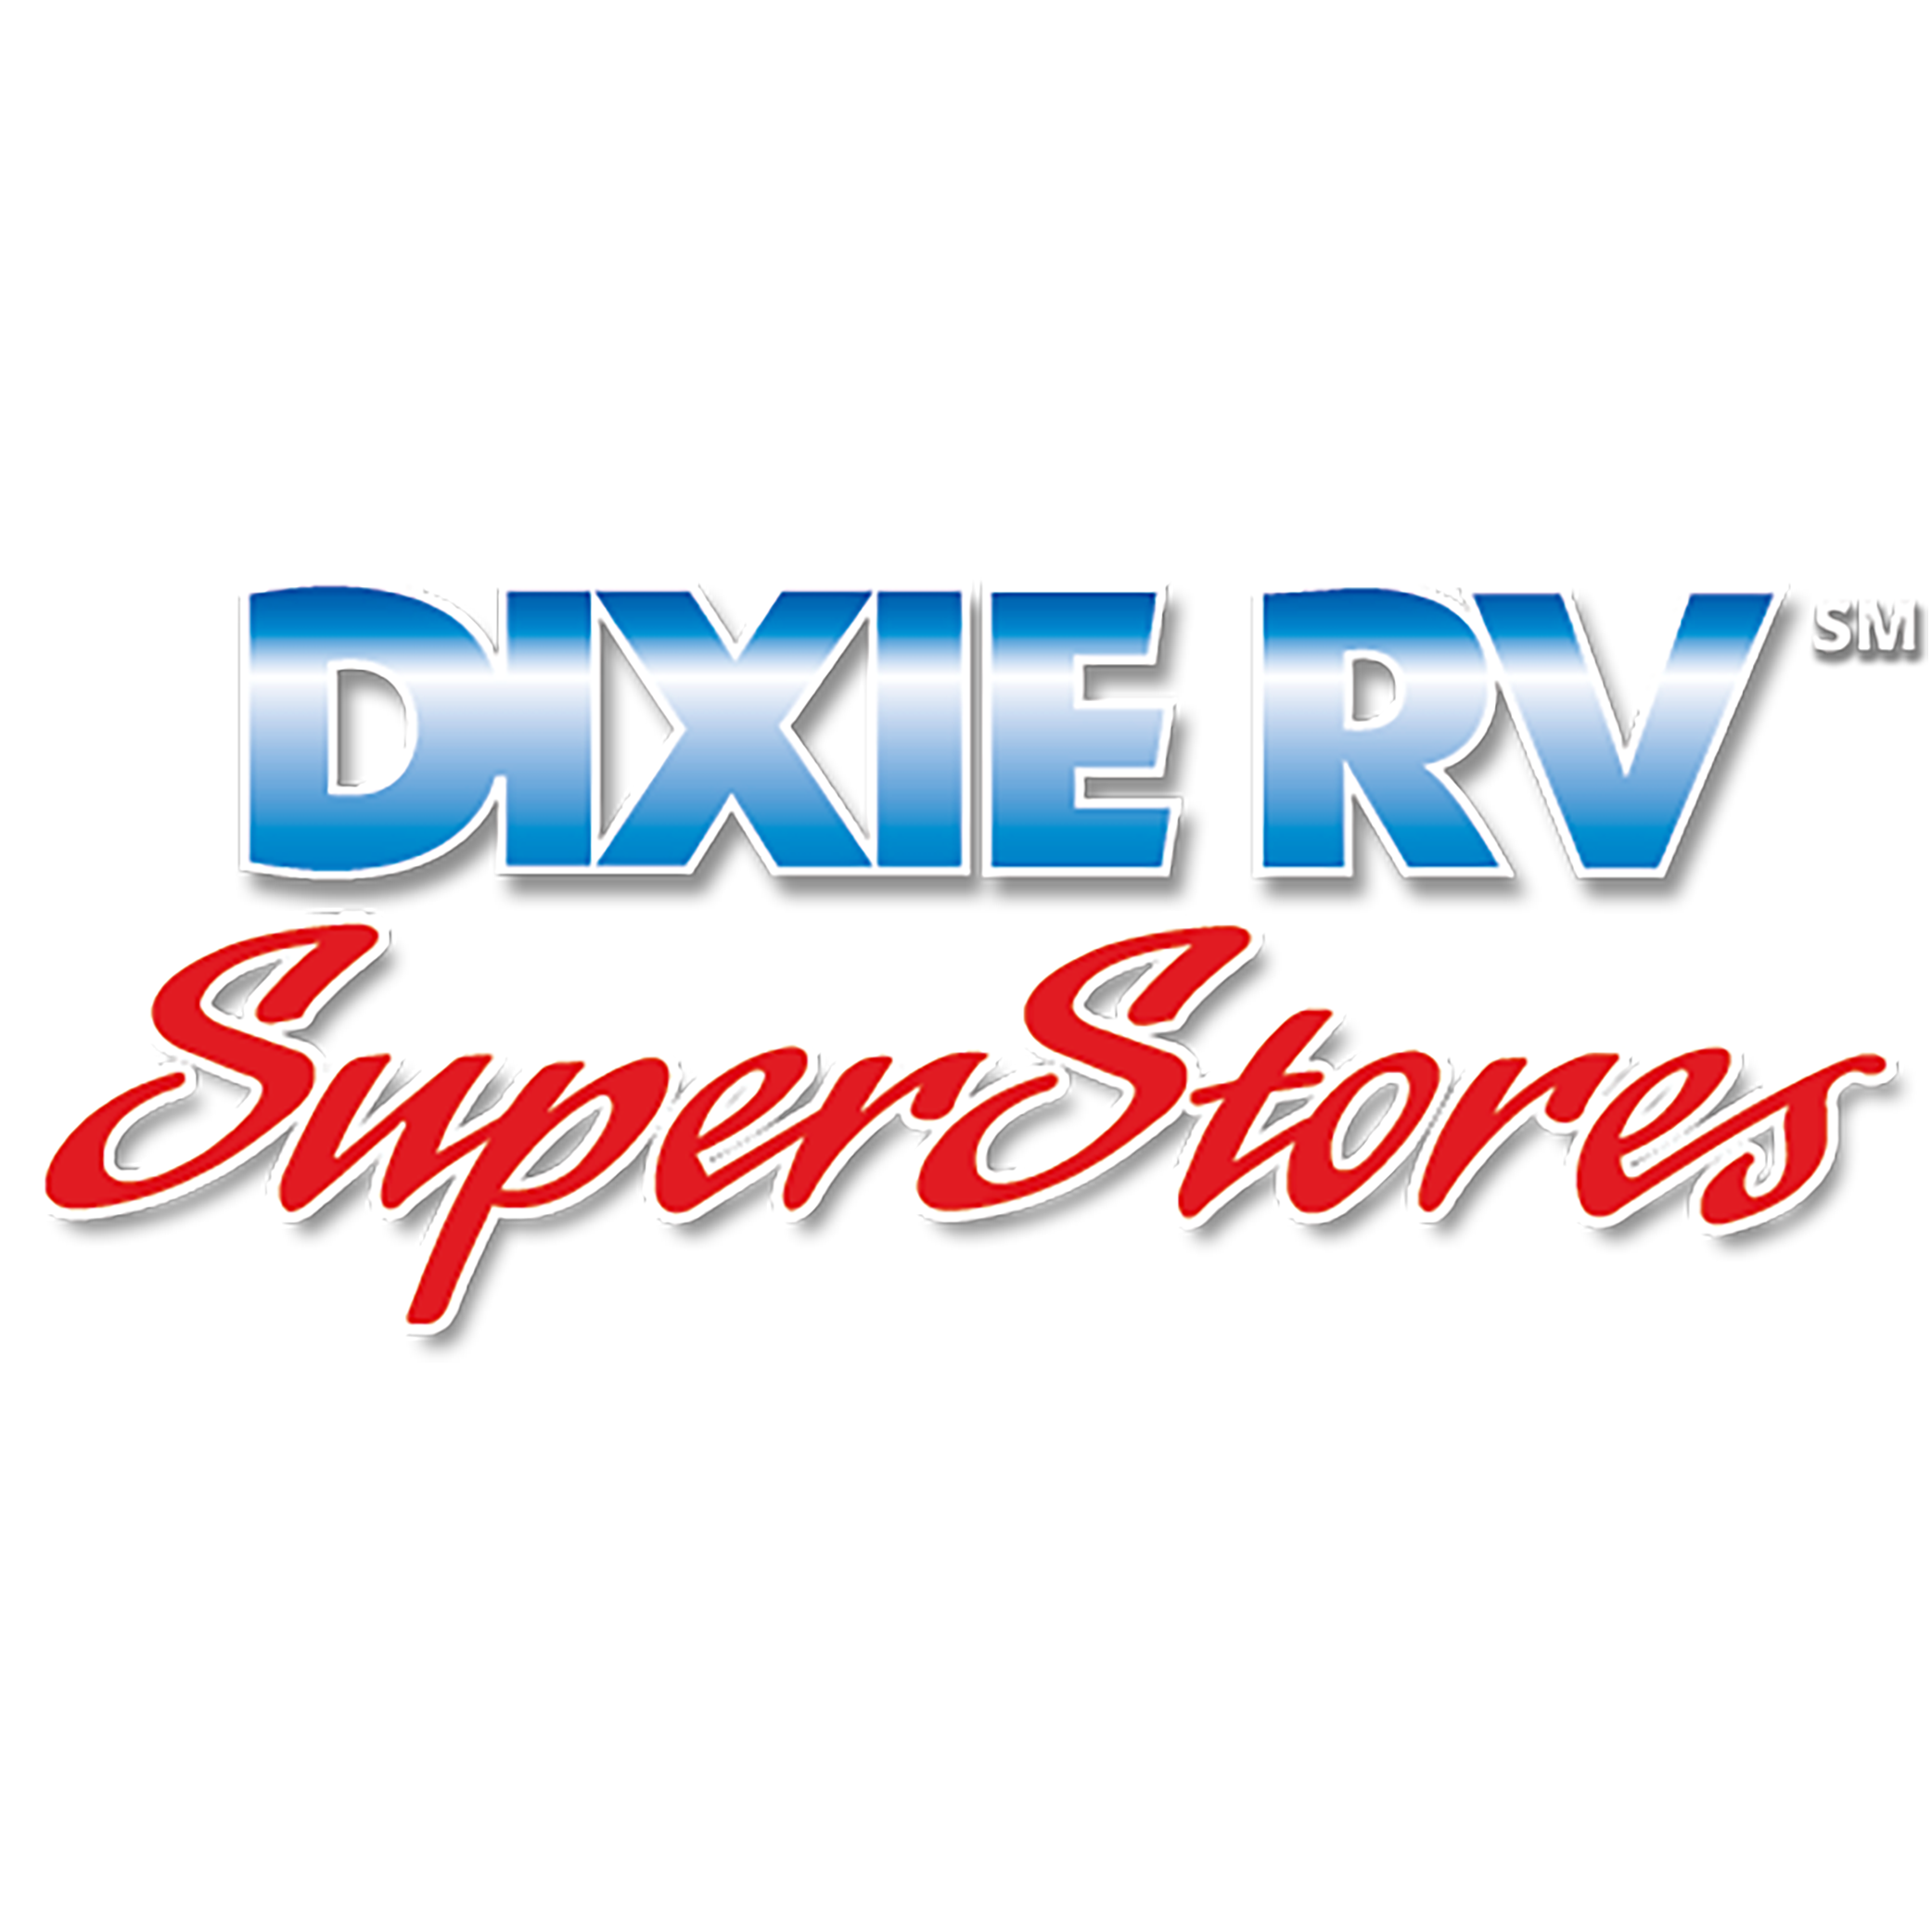 Dixe RV Superstores image 4